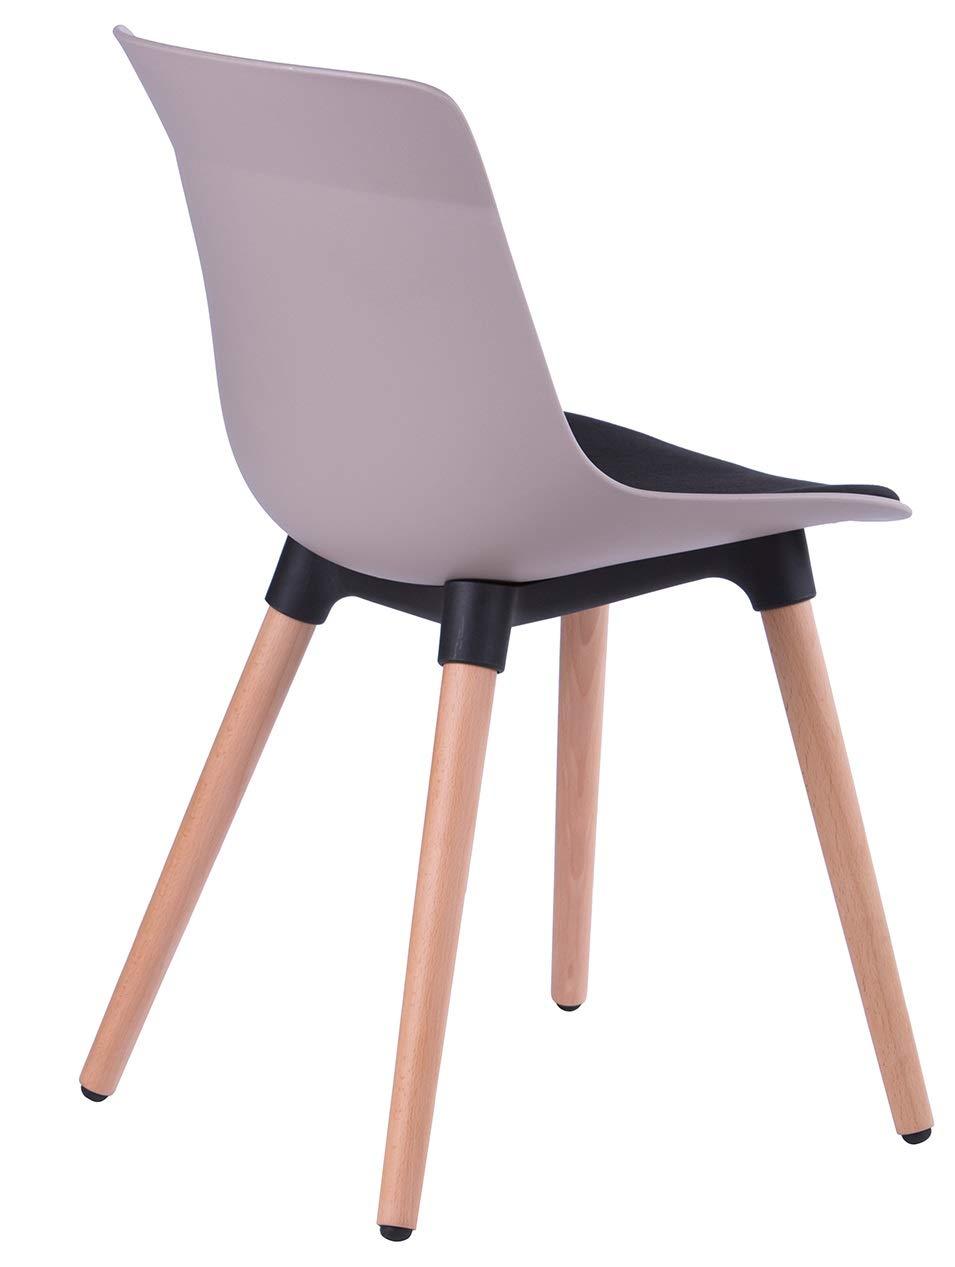 : SixBros.: Stühle